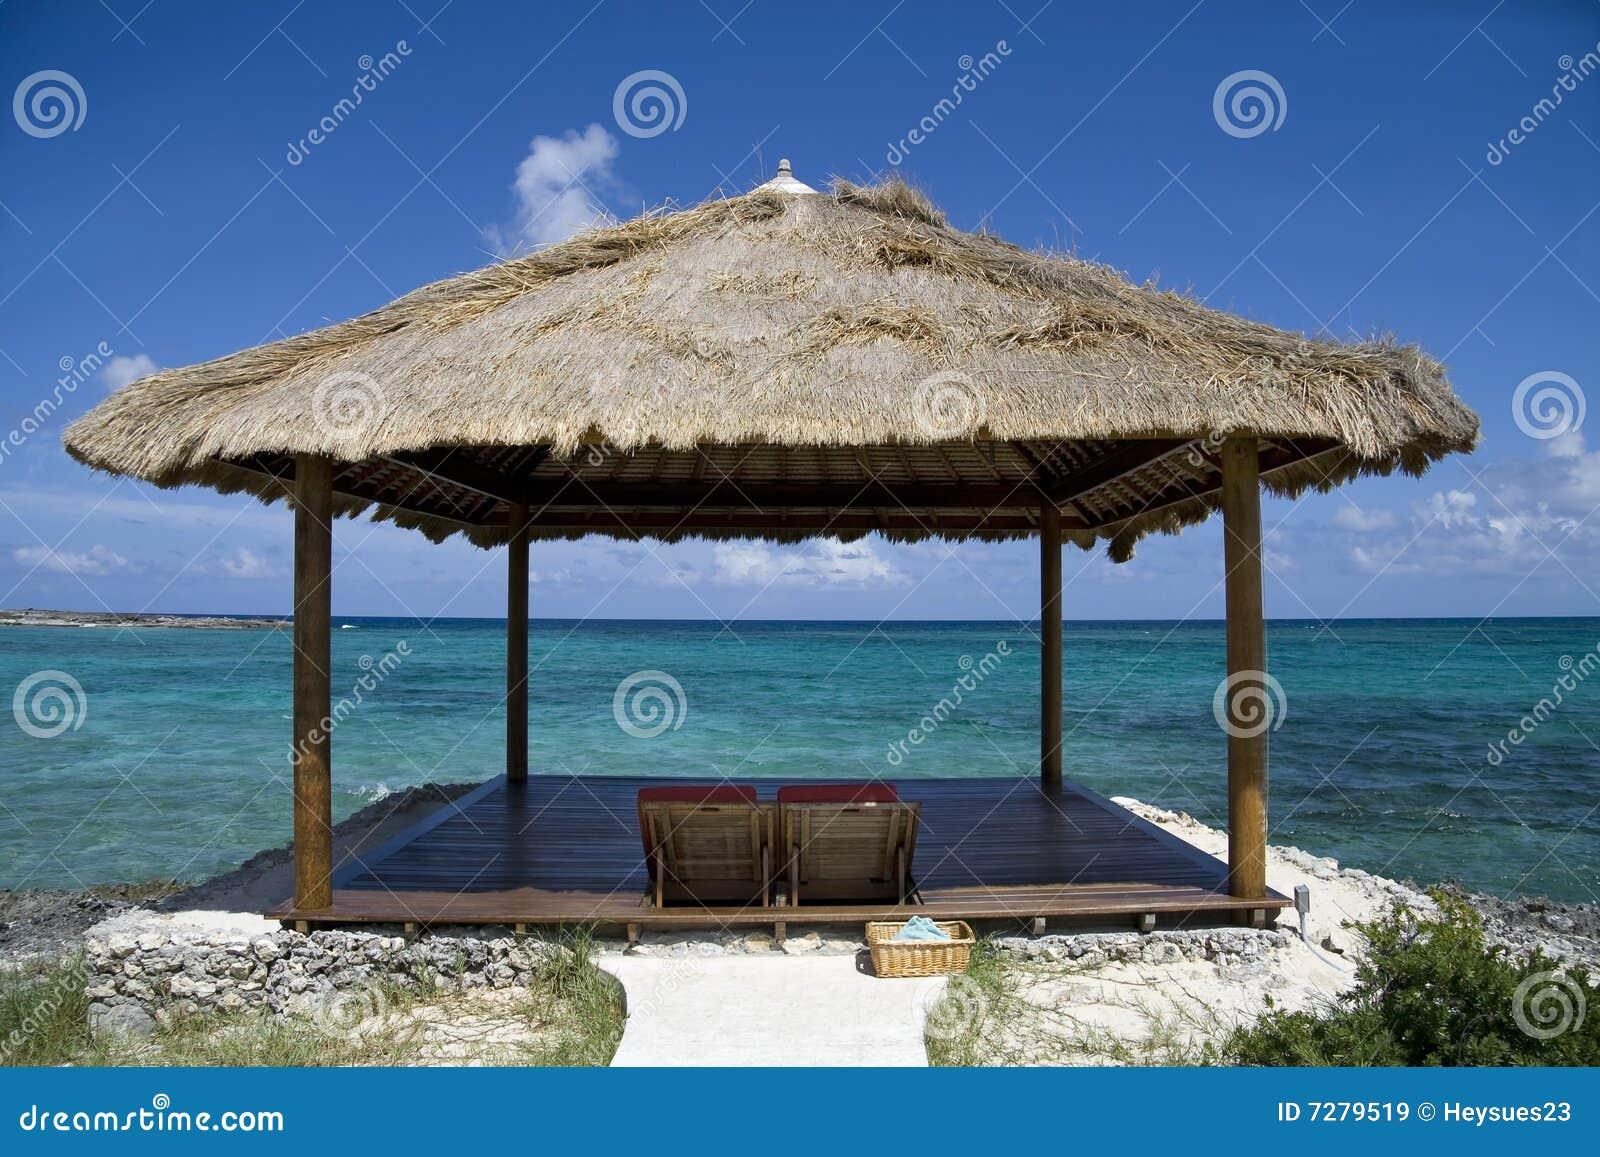 Tropical Beach Huts: Tropical Island Beach Hut Stock Image. Image Of Island